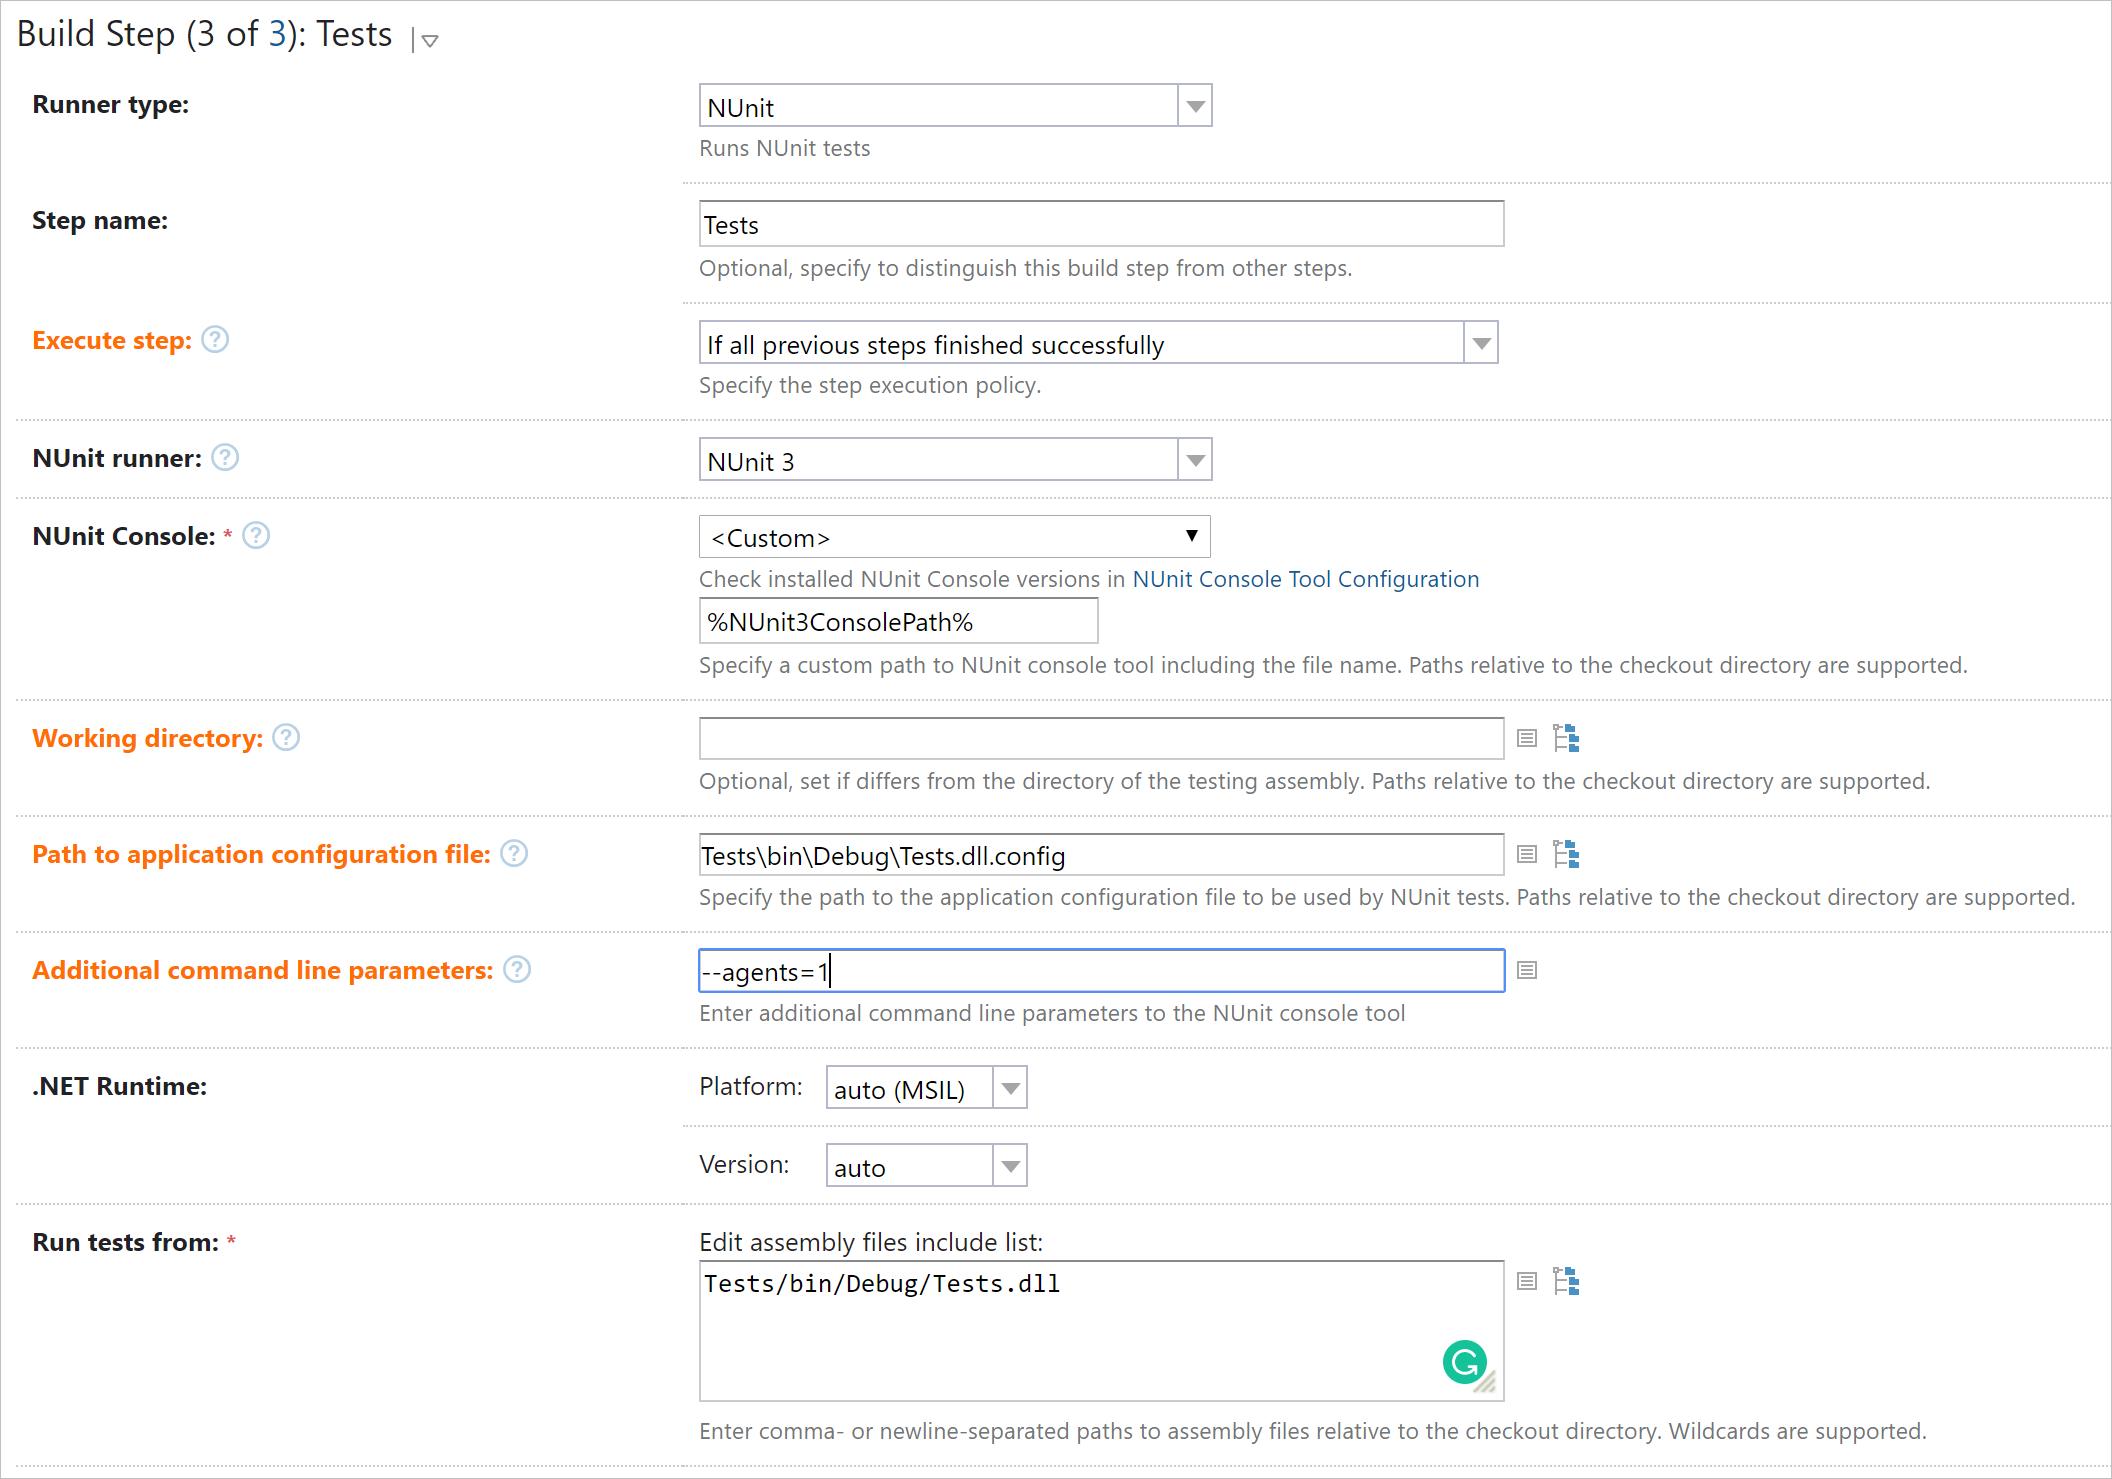 Build step: NUnit, advanced options